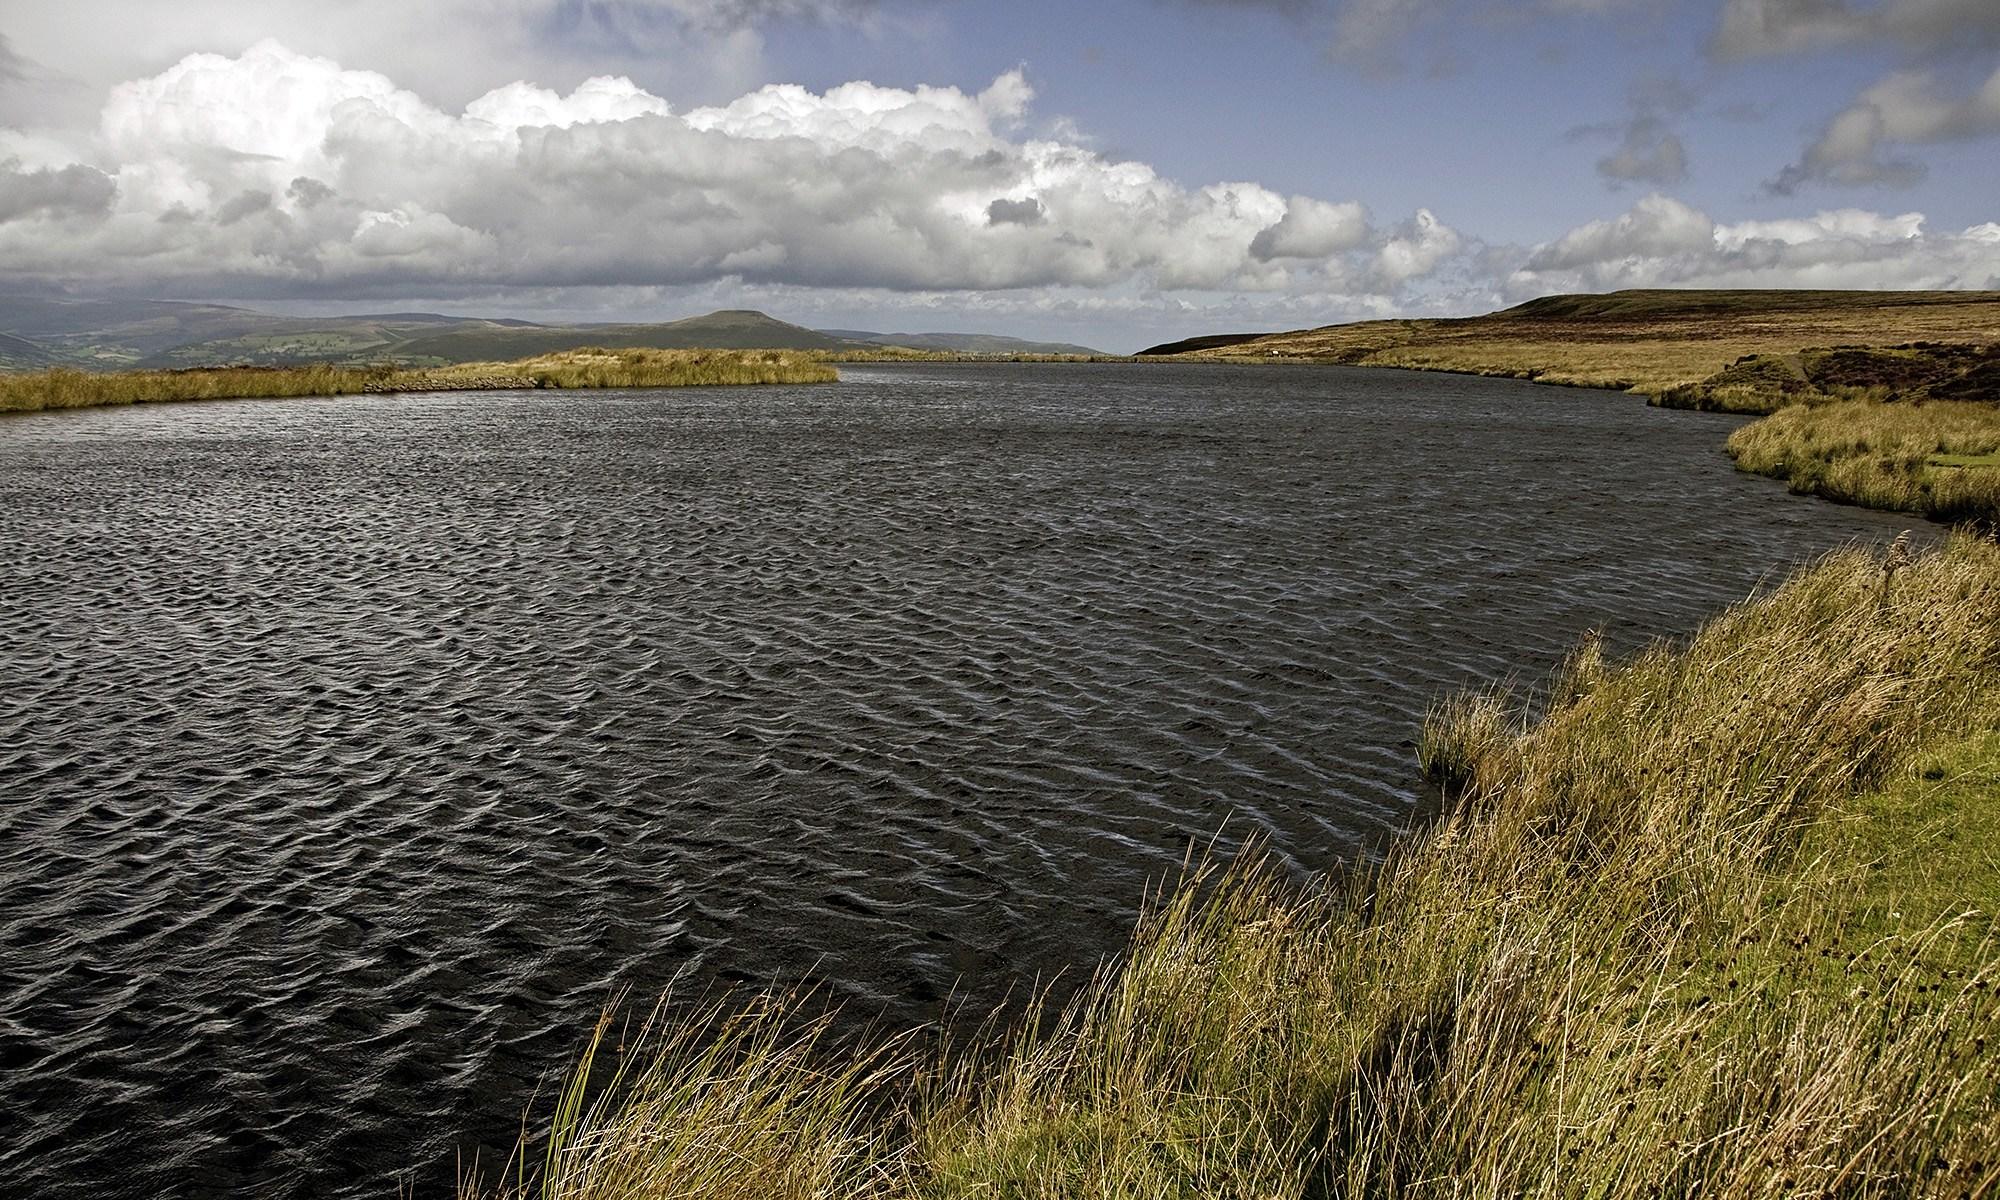 Keepers Pond Bleanaven, Wales